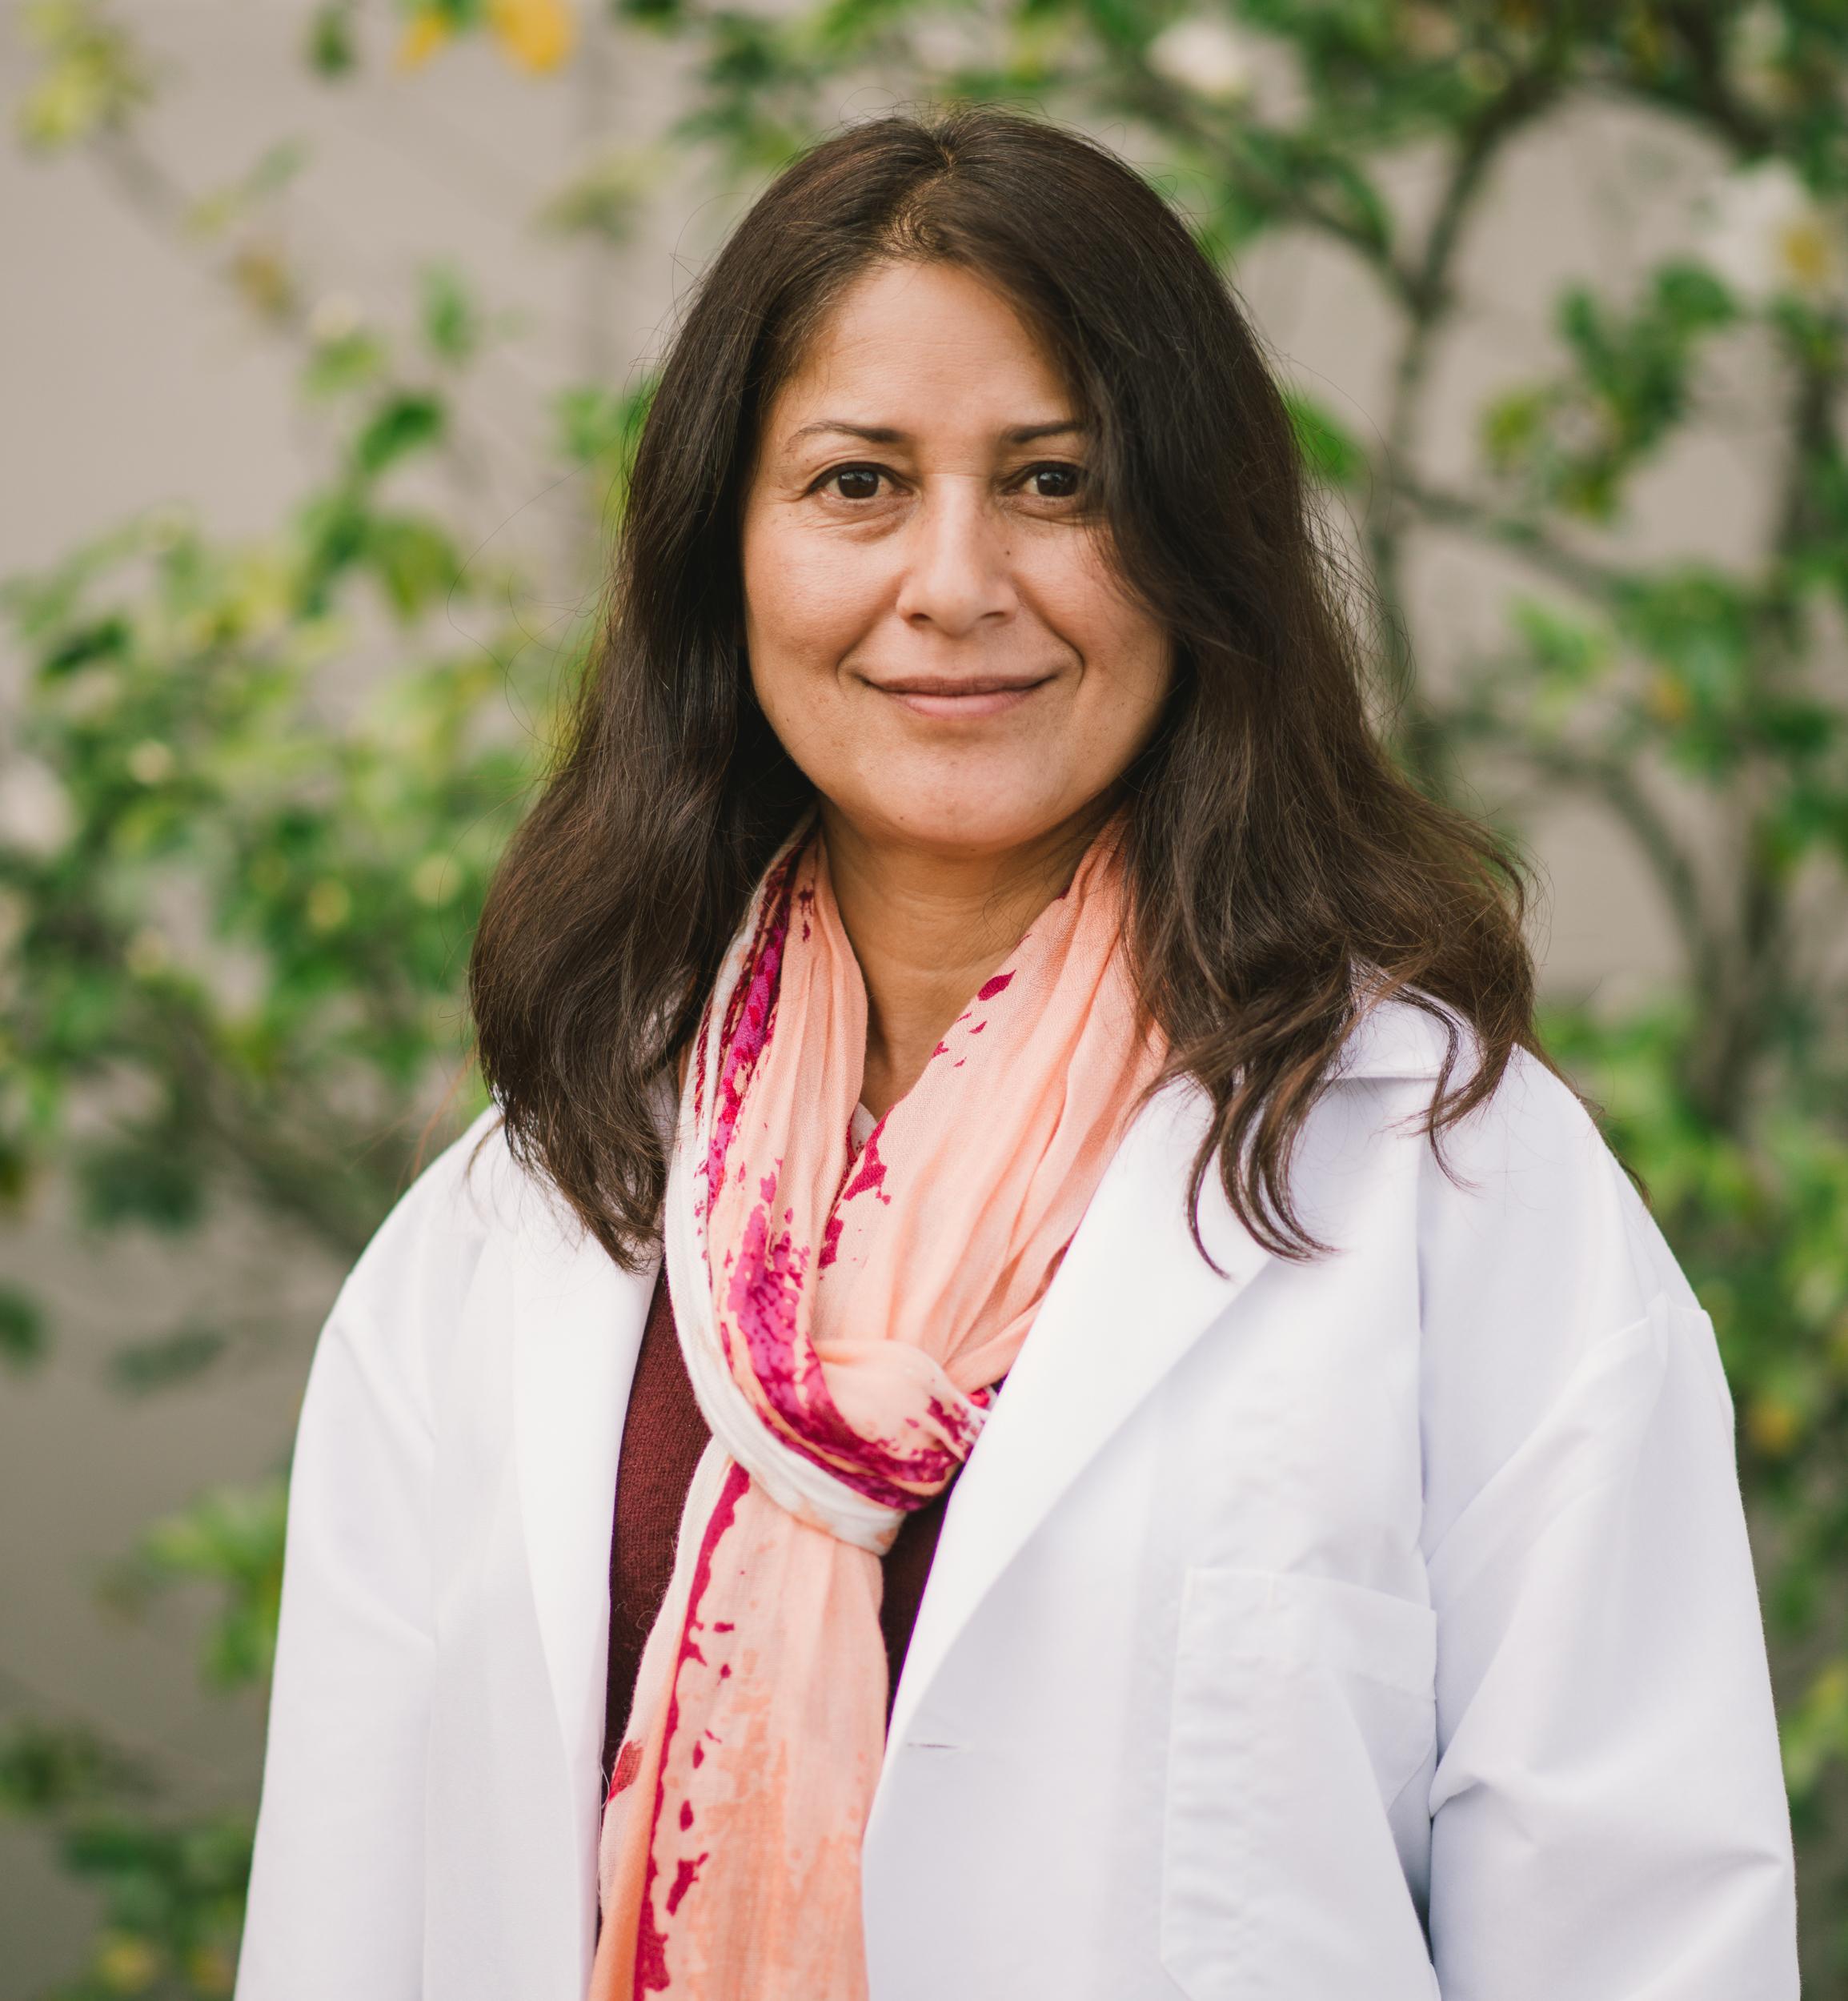 Sangeeta Gambhir, body imaging radiology, nuclear medicine radiology